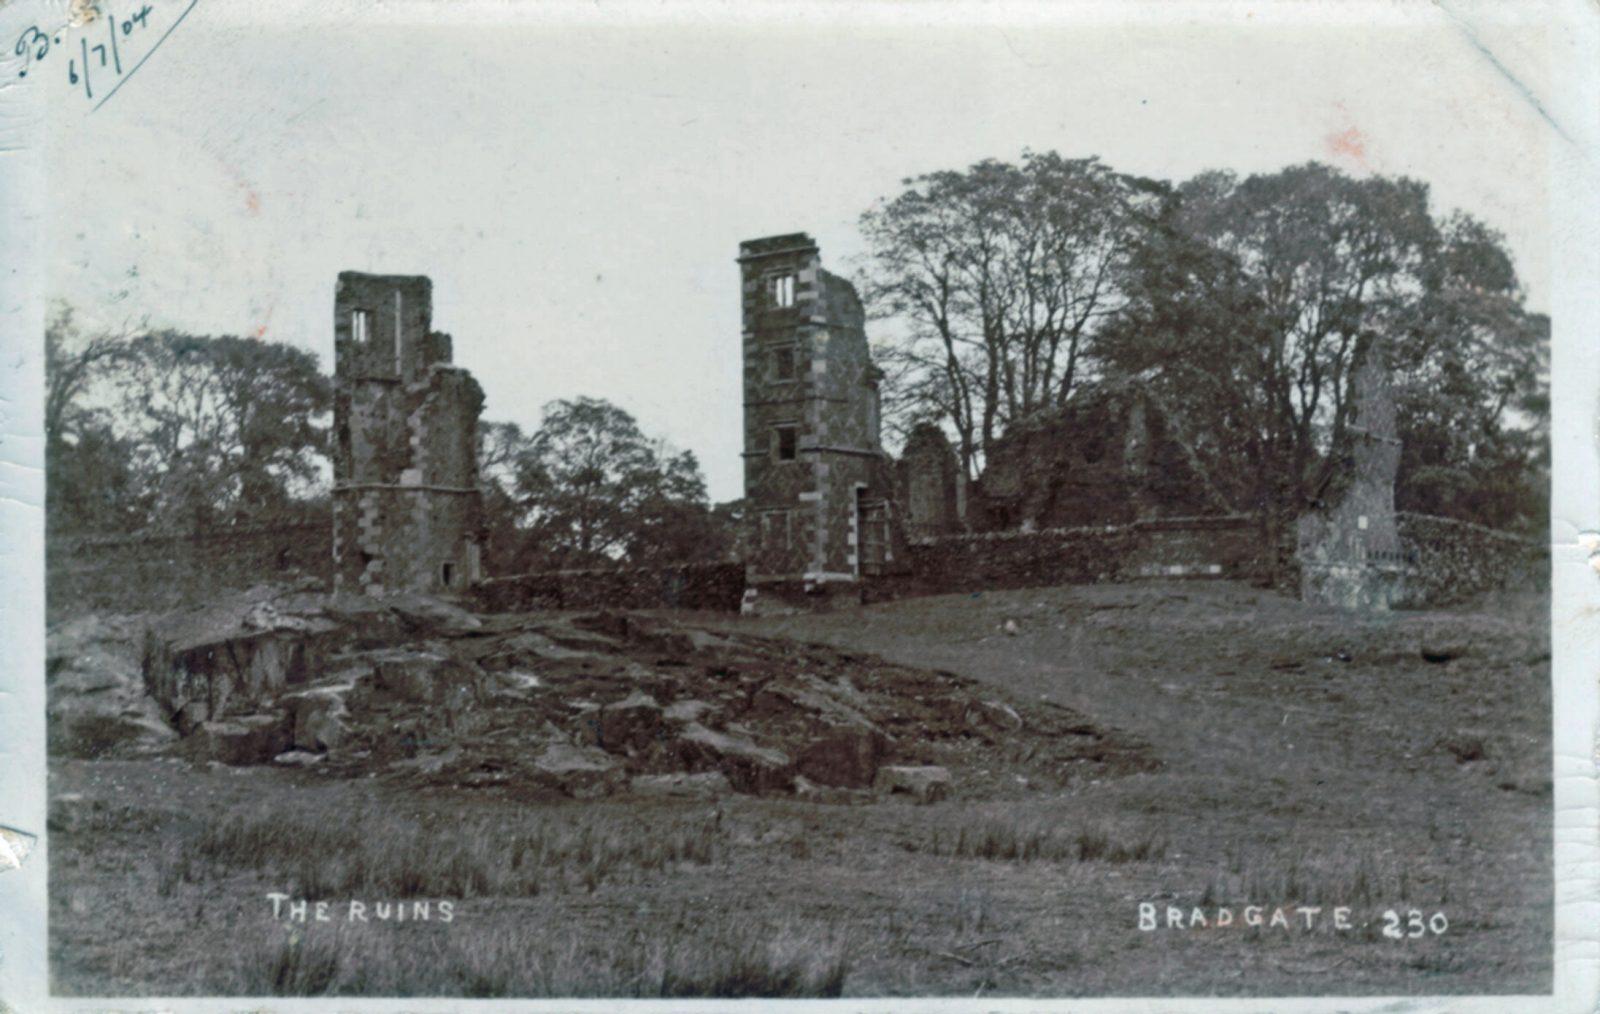 Bradgate Park, Leicester. 1901-1920: Ruins of Bradgate House. Franked 1904 (File:1126)